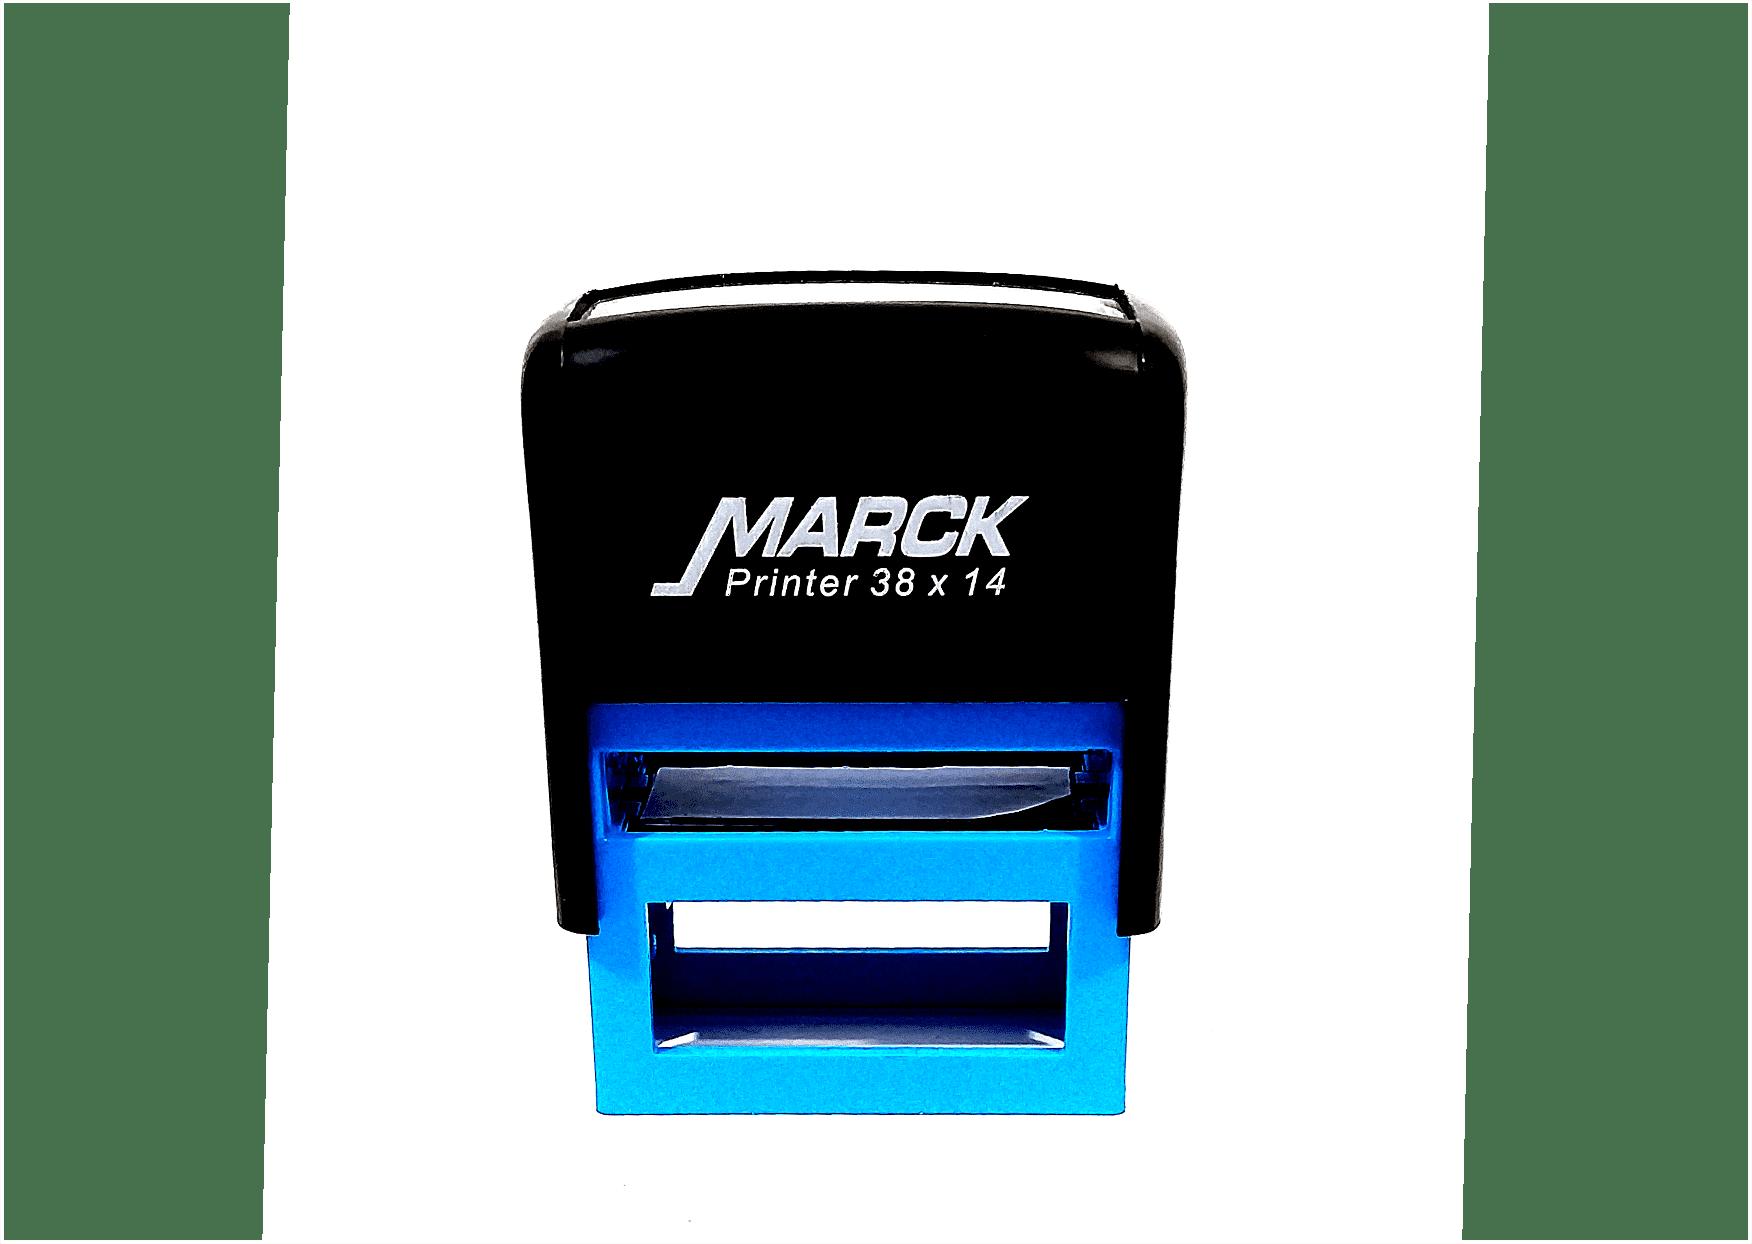 Carimbo Automático Marck 14x38